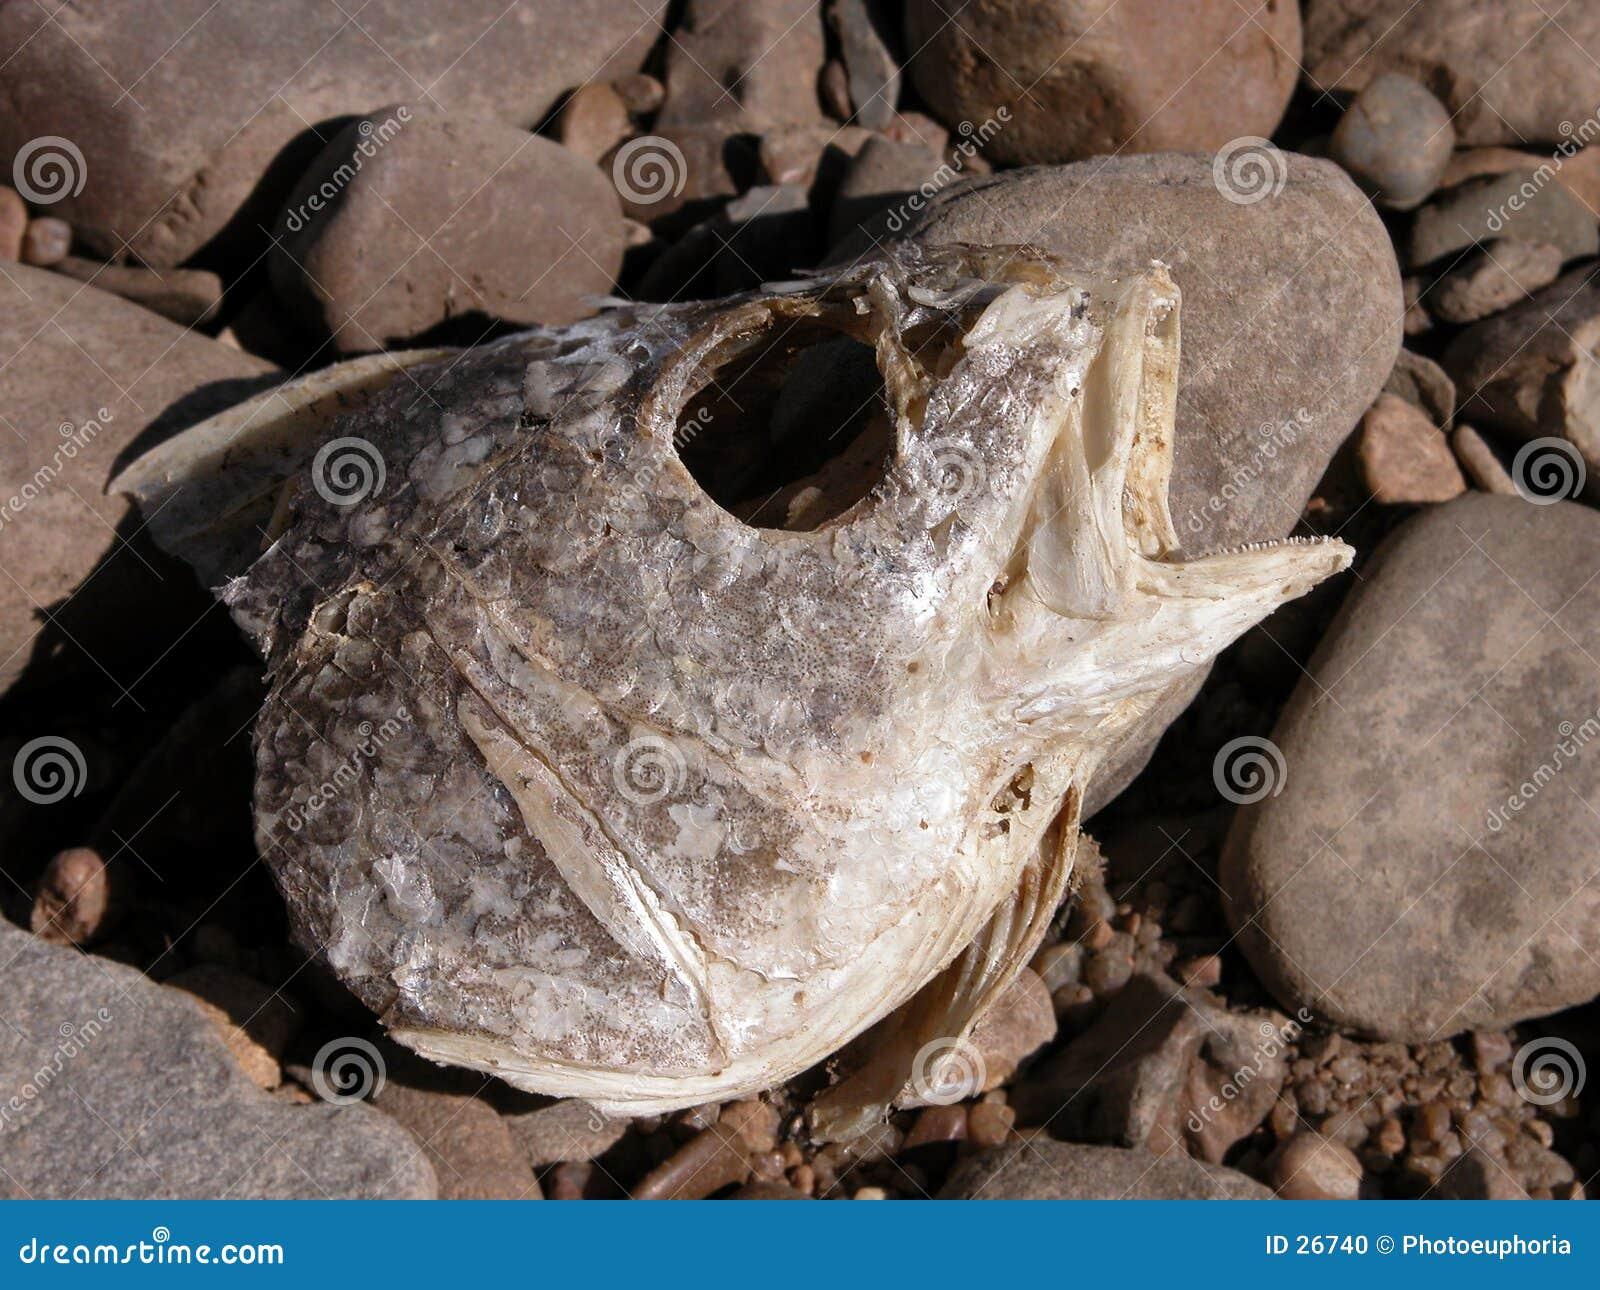 Rotting Fish Head on the River Rocks